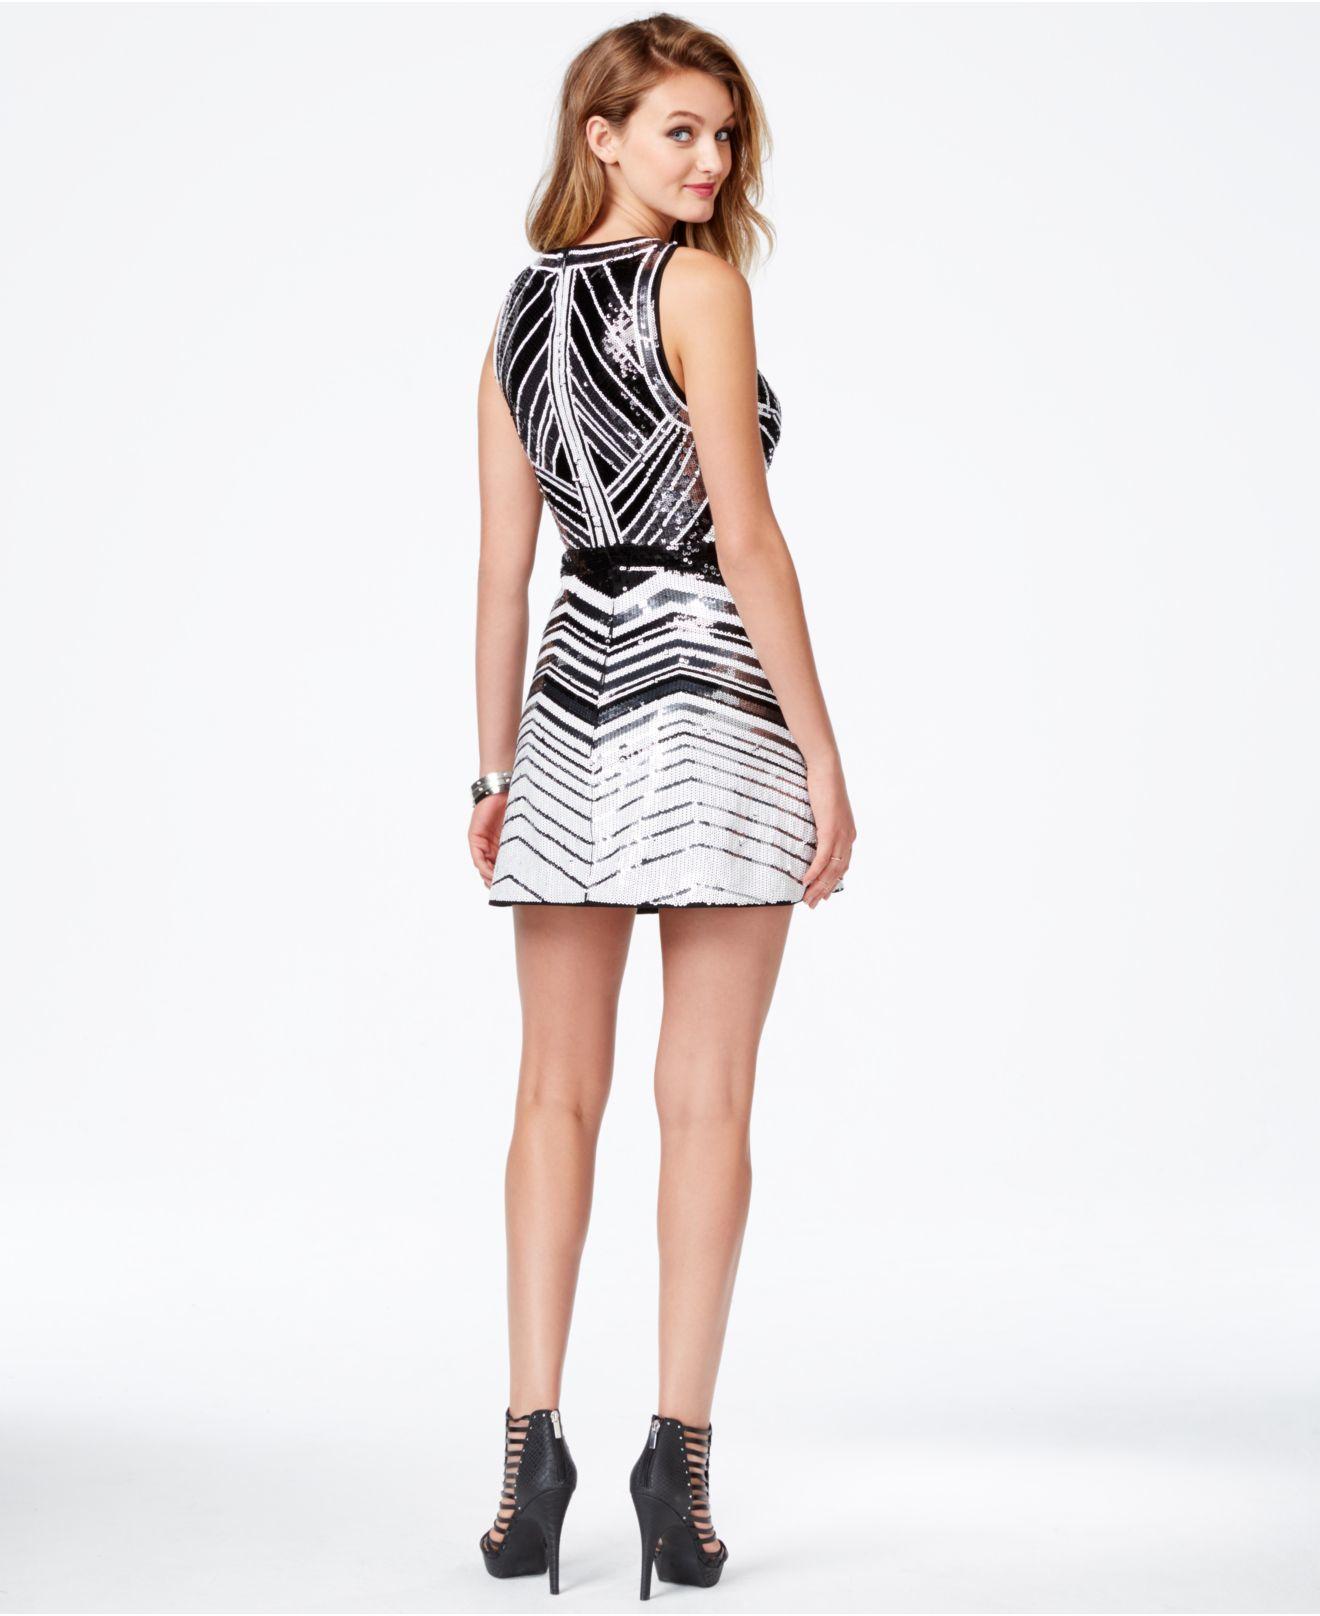 Lyst - Guess Chevron-print Sequin Sheath Dress in Black